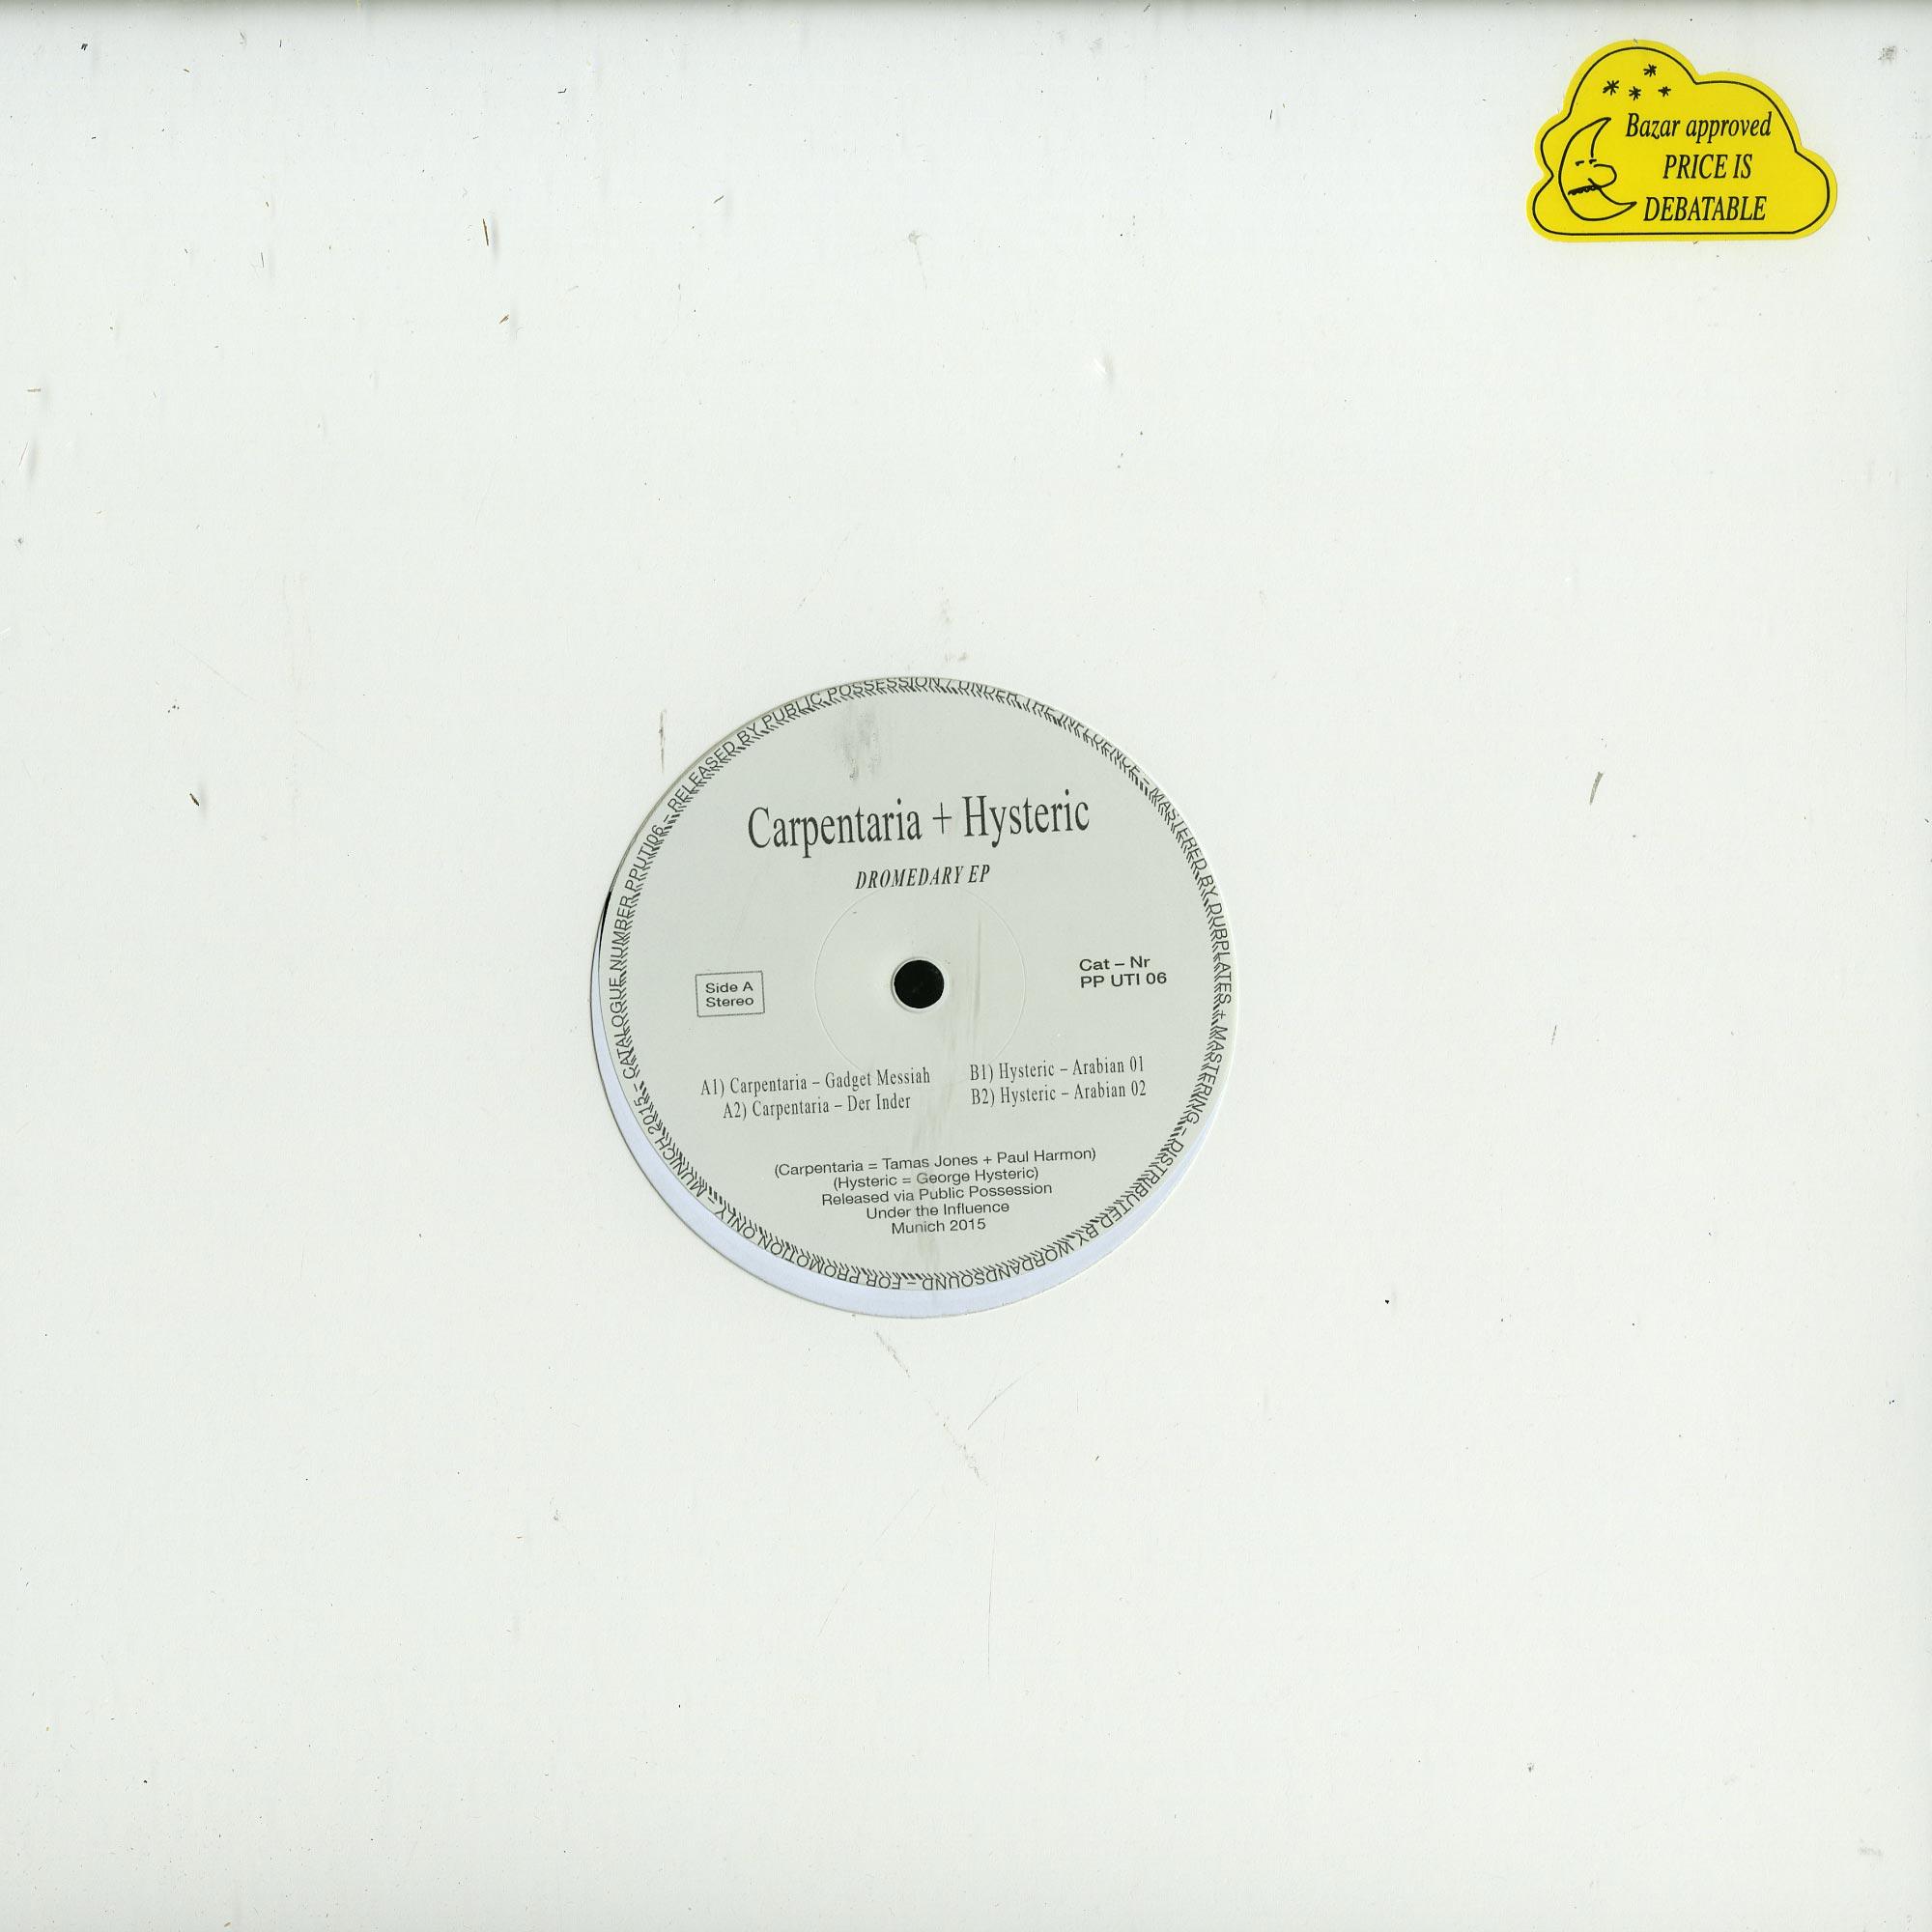 Carpentaria & Hysteric - DROMEDARY EP